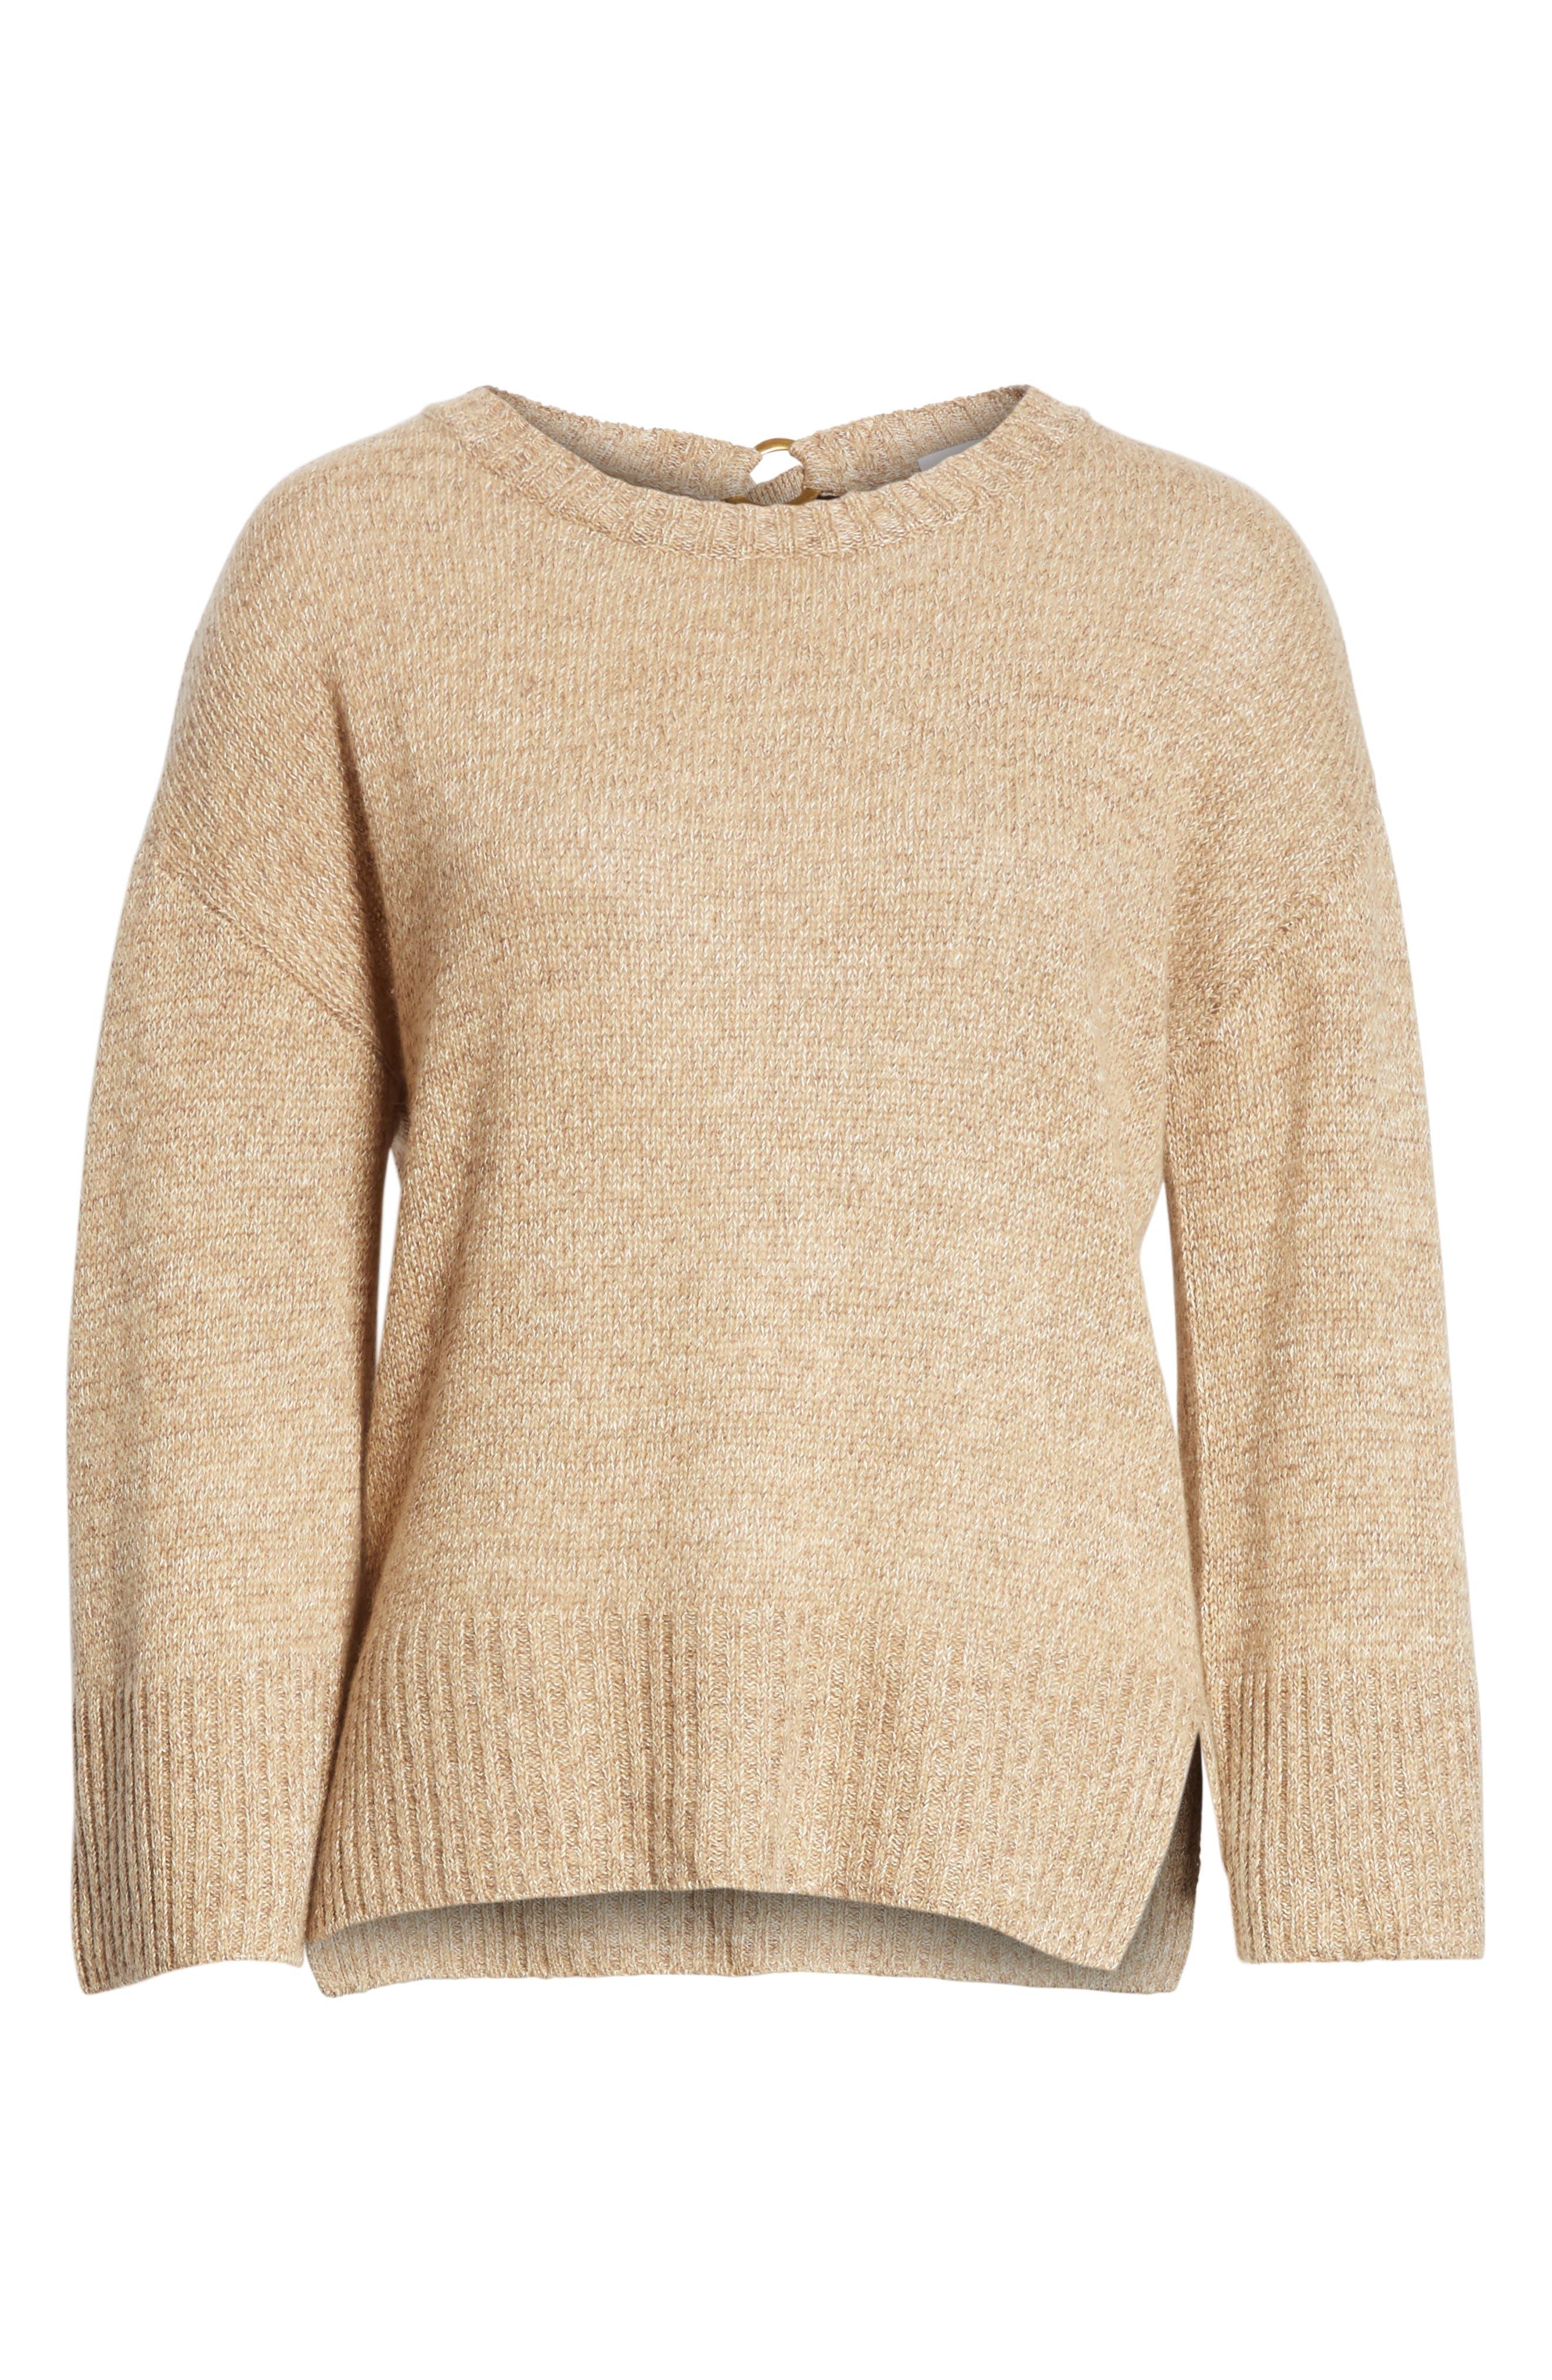 Keyhole Back Sweater,                             Alternate thumbnail 6, color,                             Camel